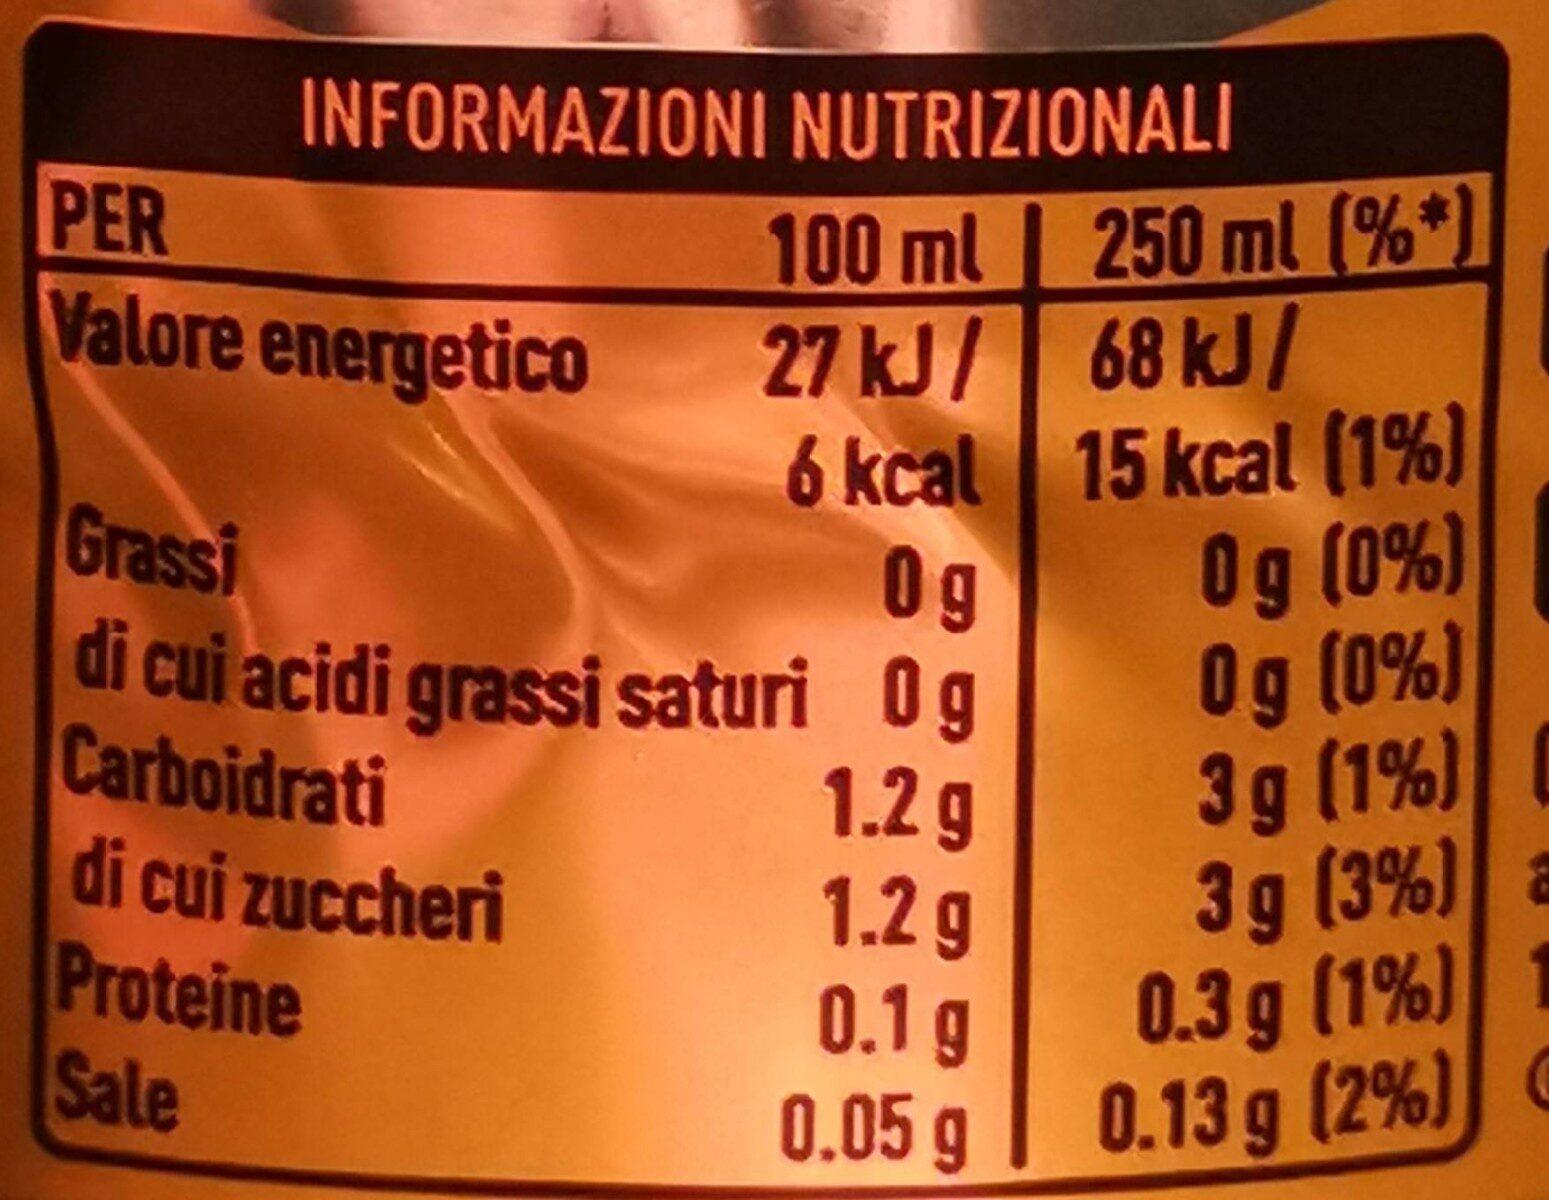 Fanta zéro orange - Valori nutrizionali - it